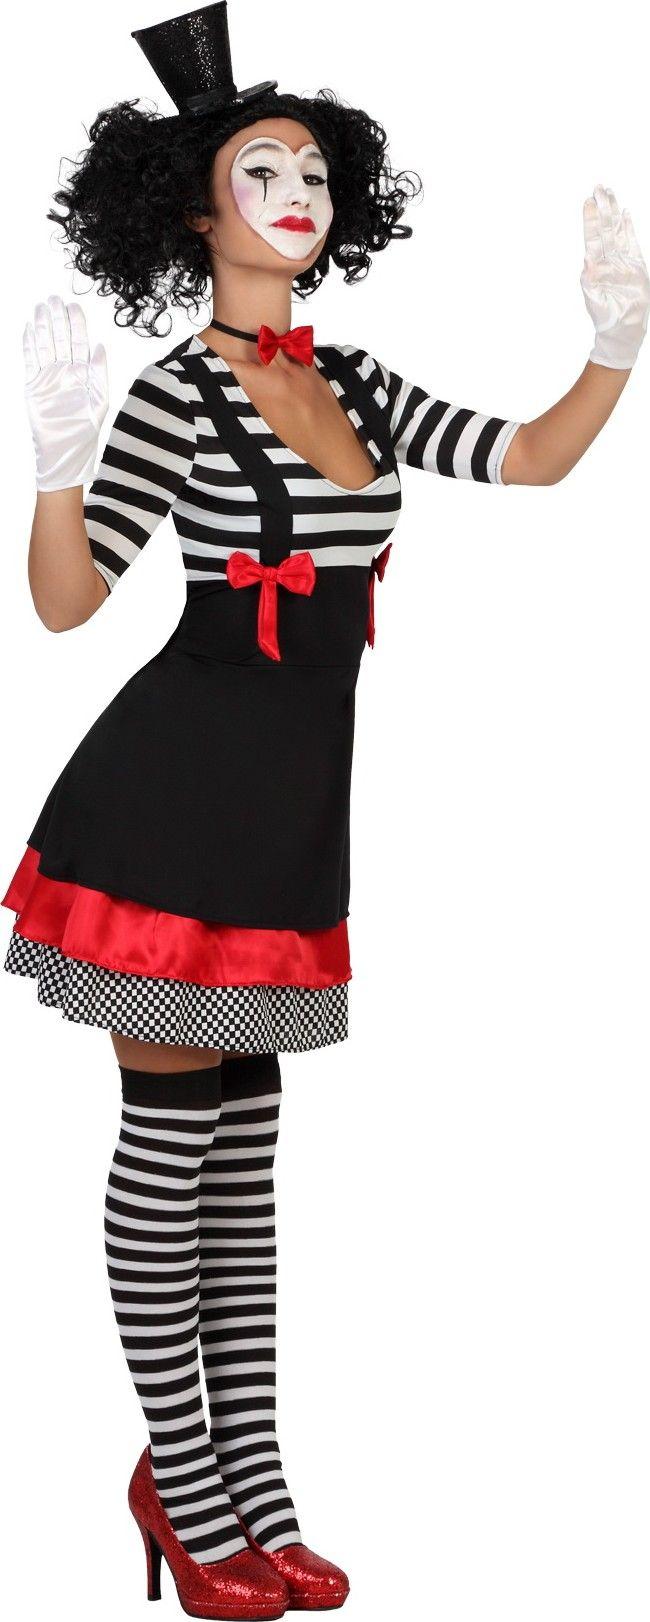 Carnavalskleding Dames Goedkoop.Mimespeler Kostuum Voor Vrouwen Dress Ups Mime Kostuum Carnaval